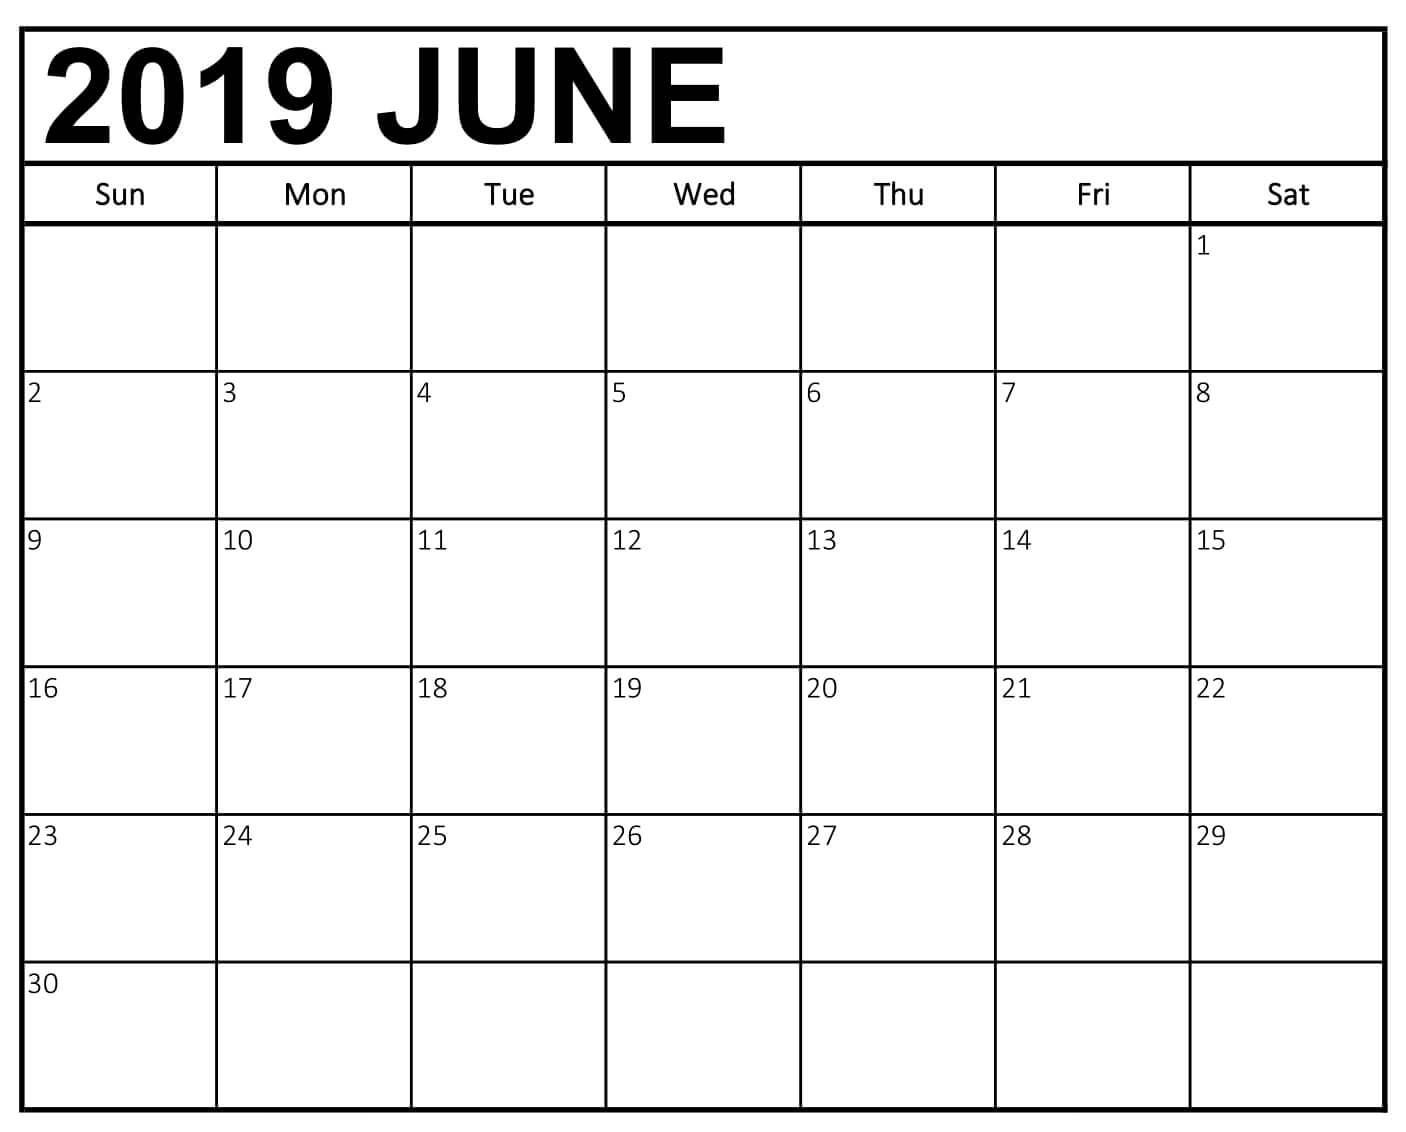 June Calendar 2019